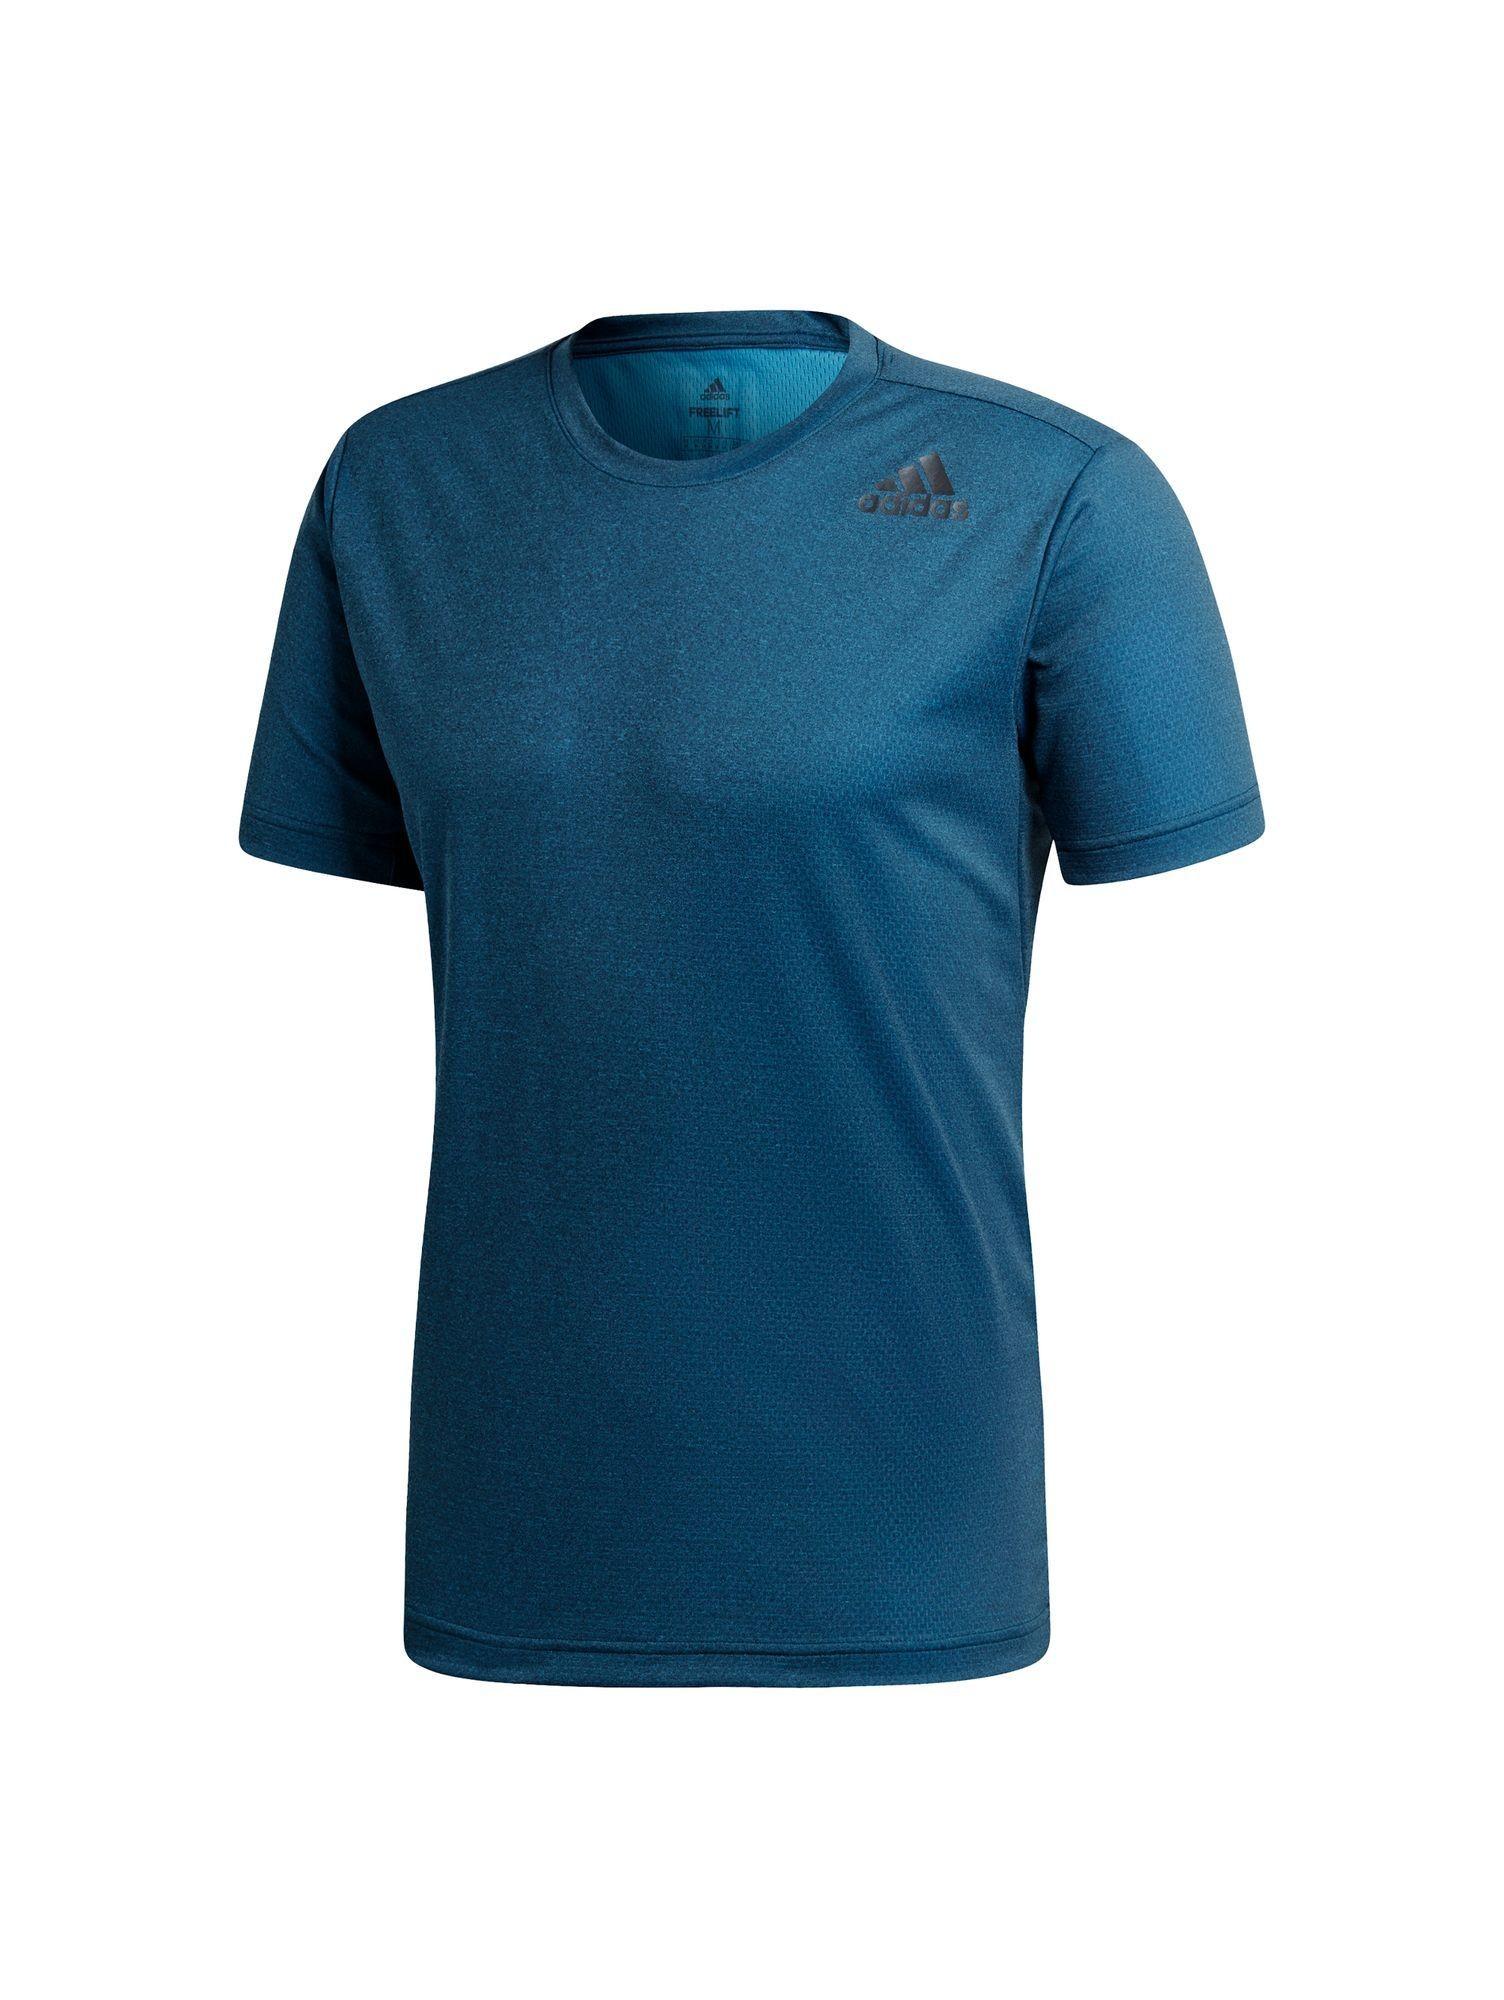 Adidas FreeLift Climalite T-Shirt